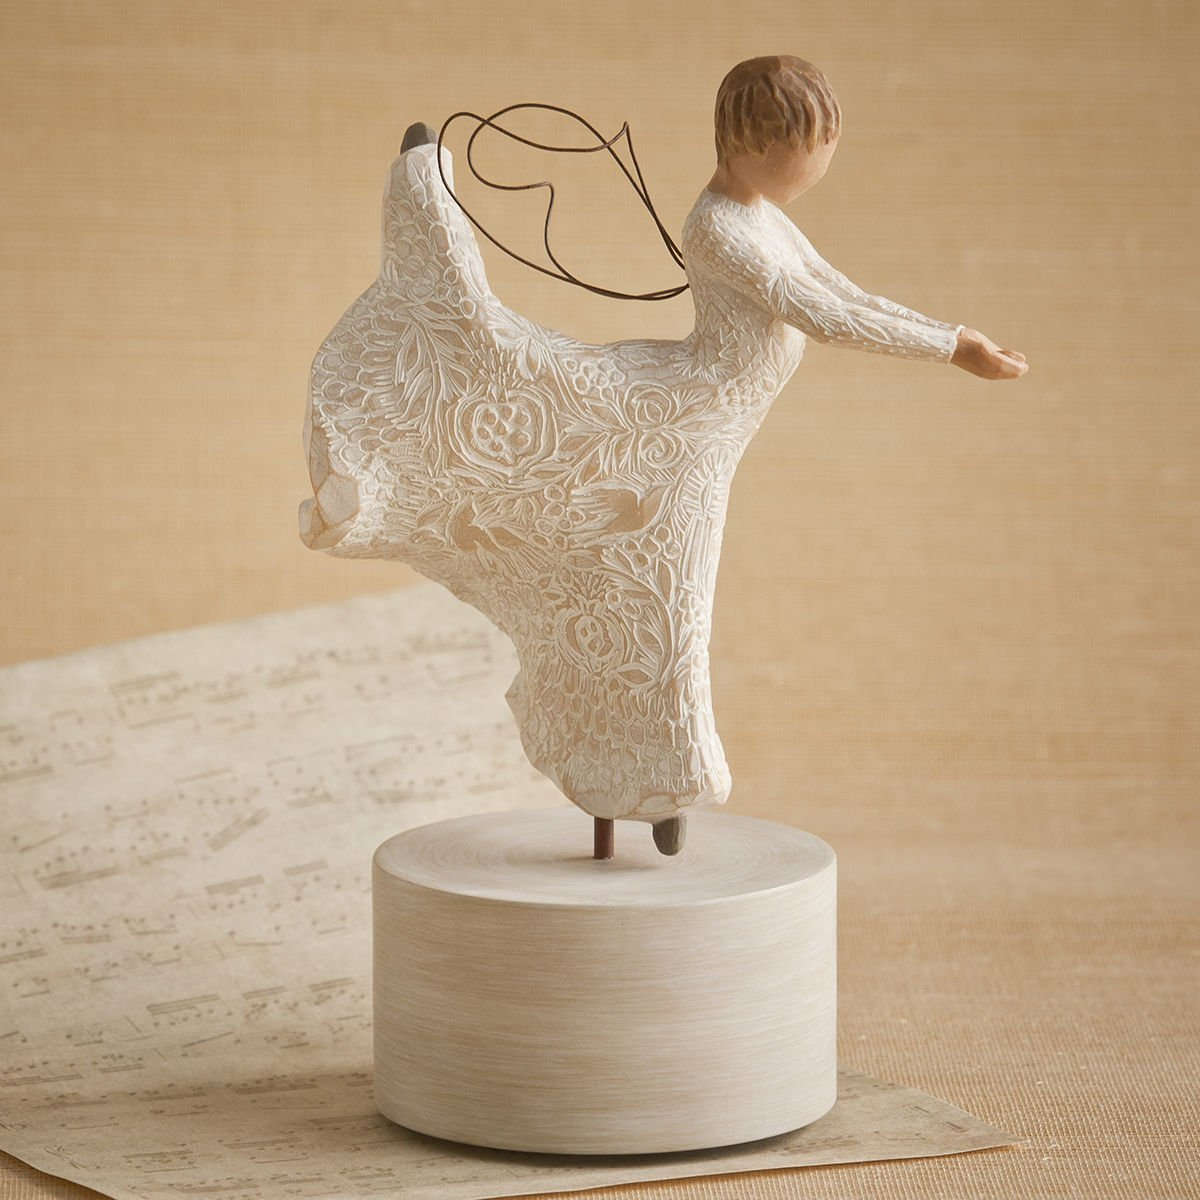 demdaco willow tree dance of life musical figurine ebay. Black Bedroom Furniture Sets. Home Design Ideas